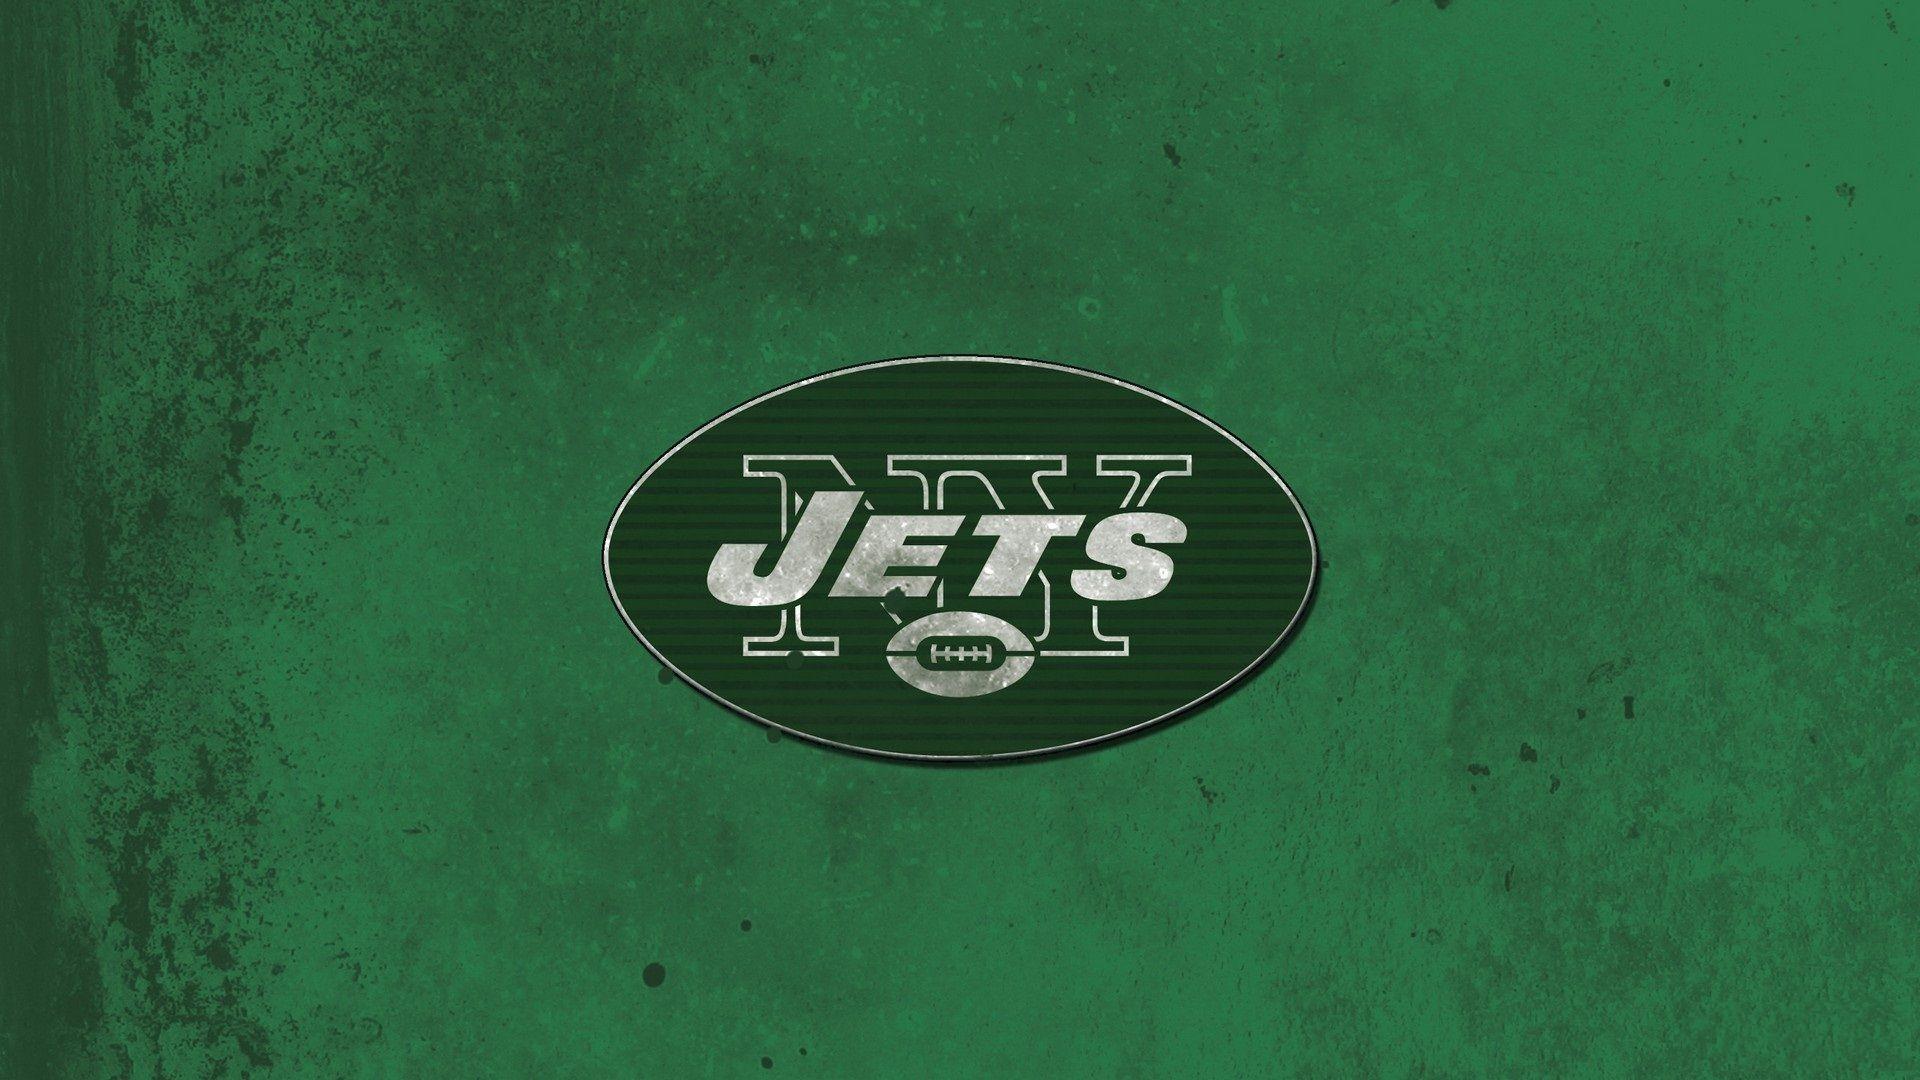 New York Jets Wallpaper Hd New York Jets Nfl Jet